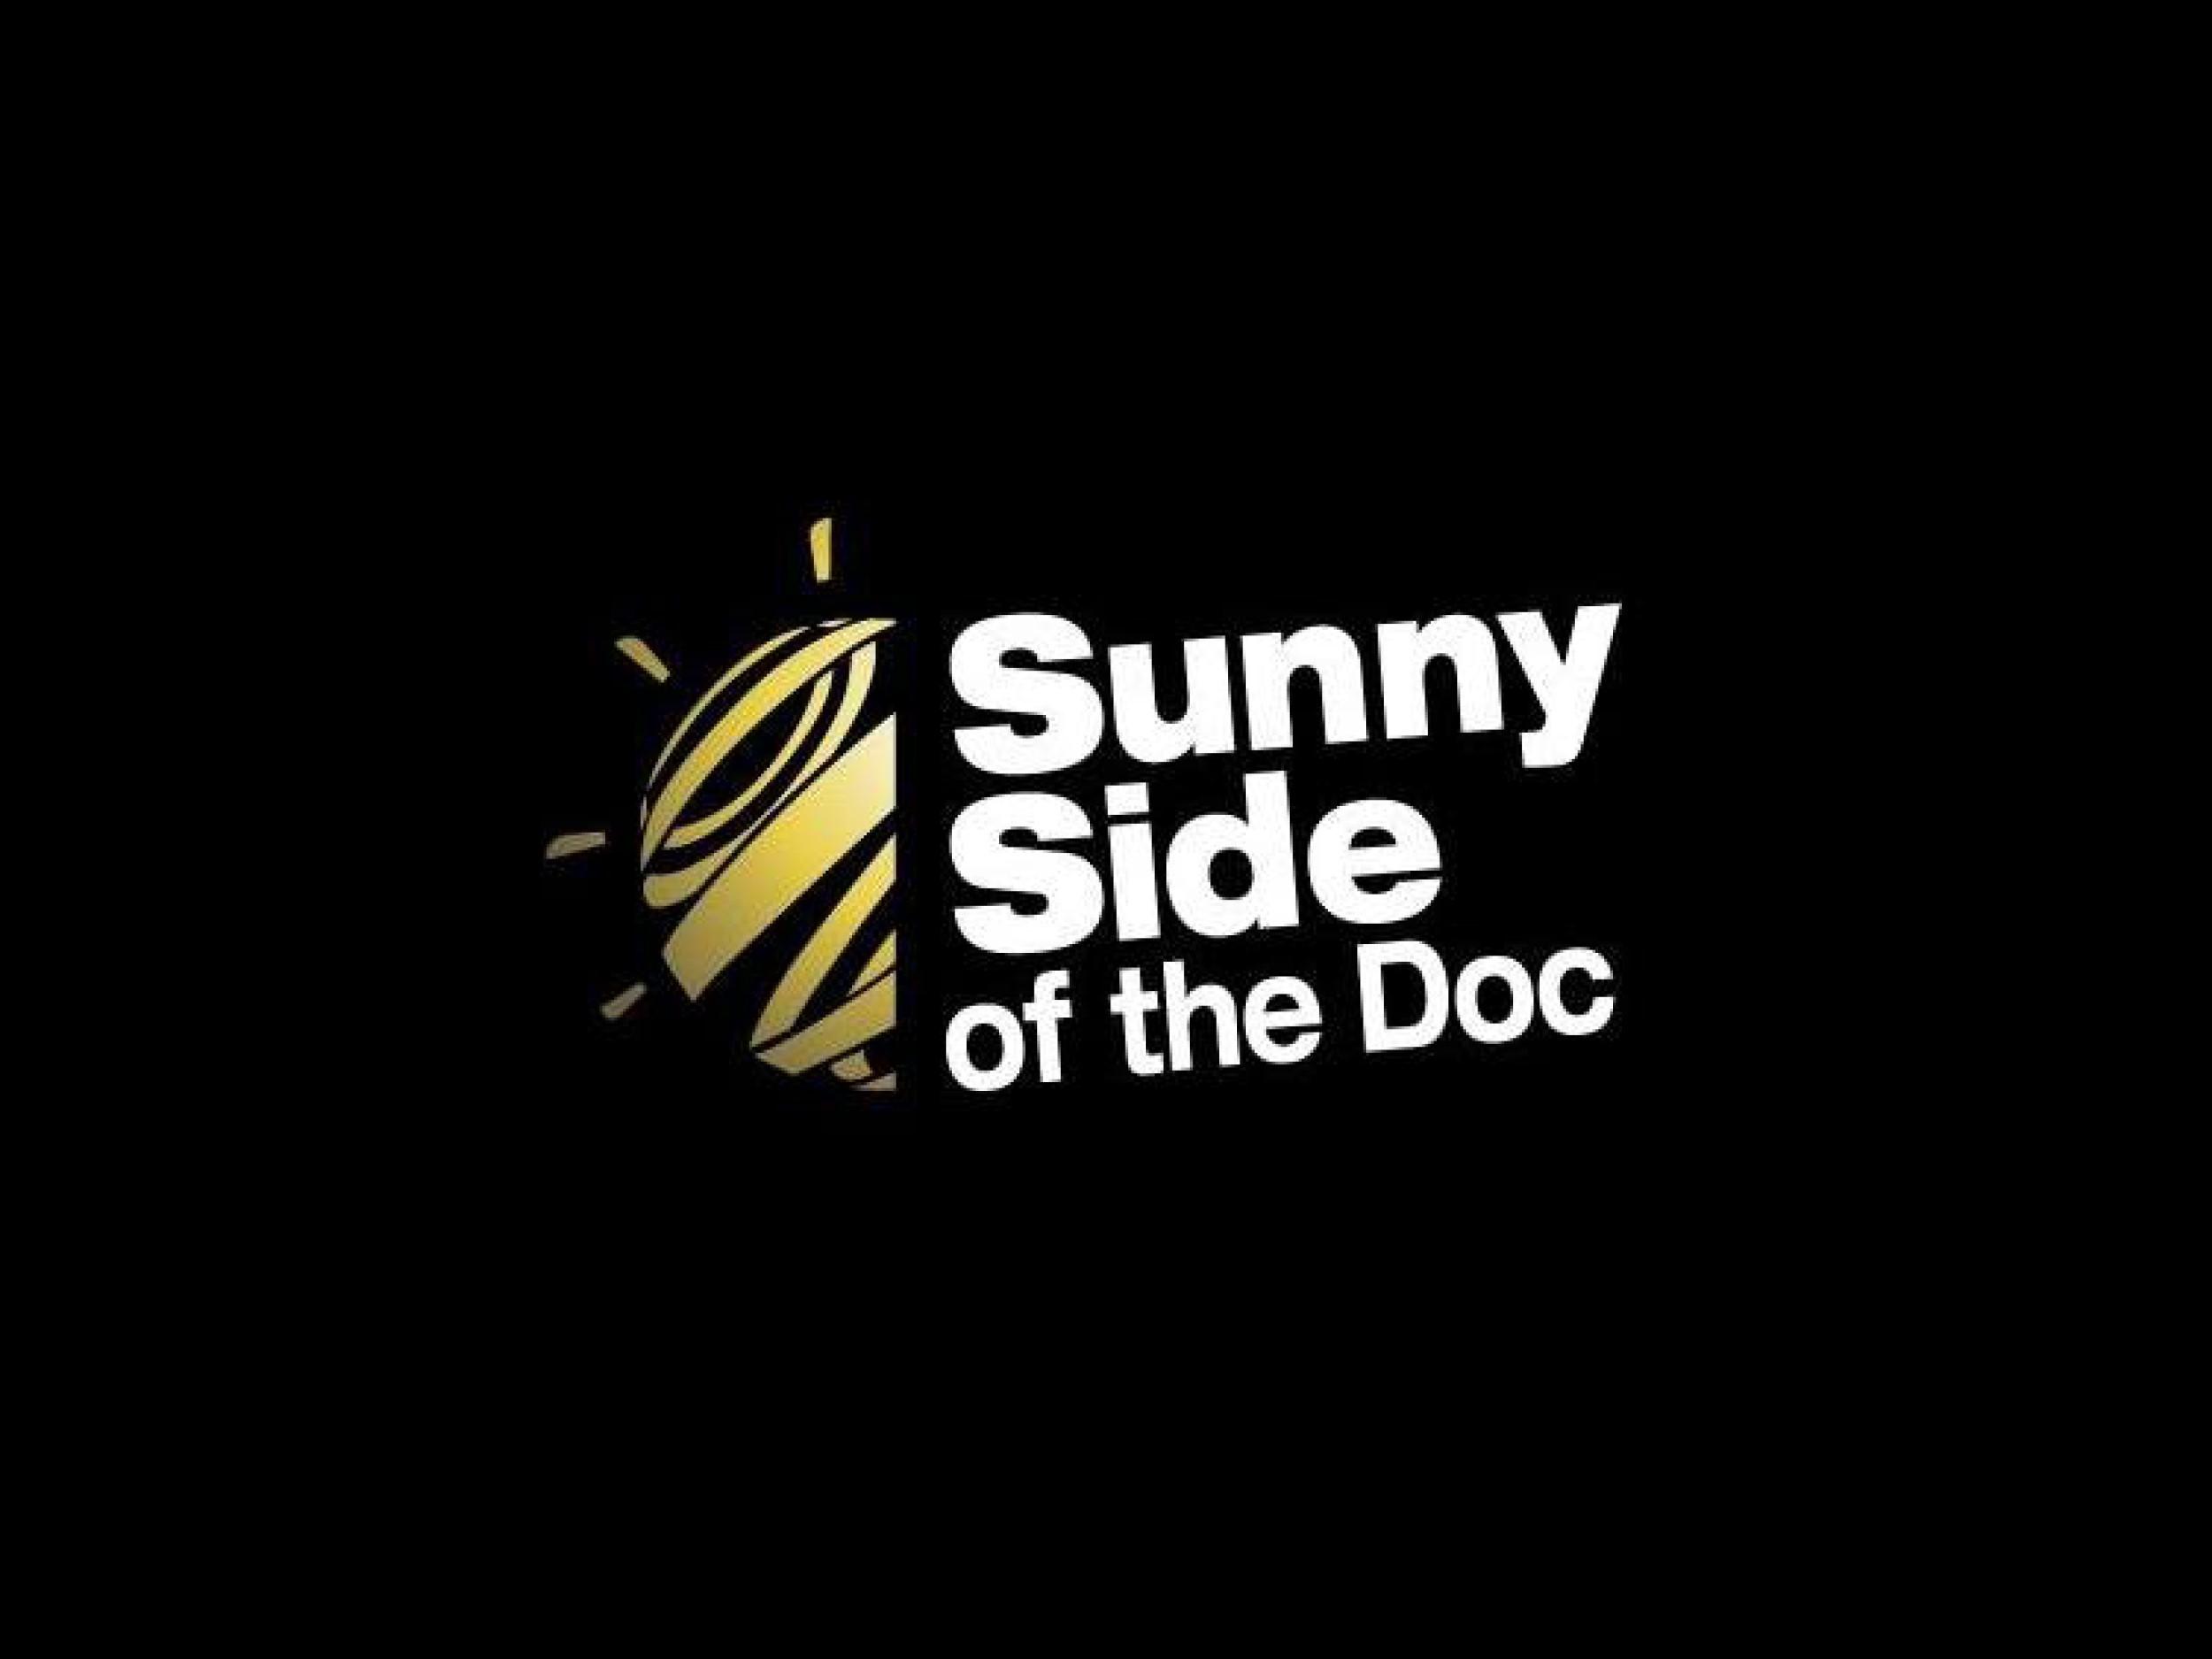 sunny side 2